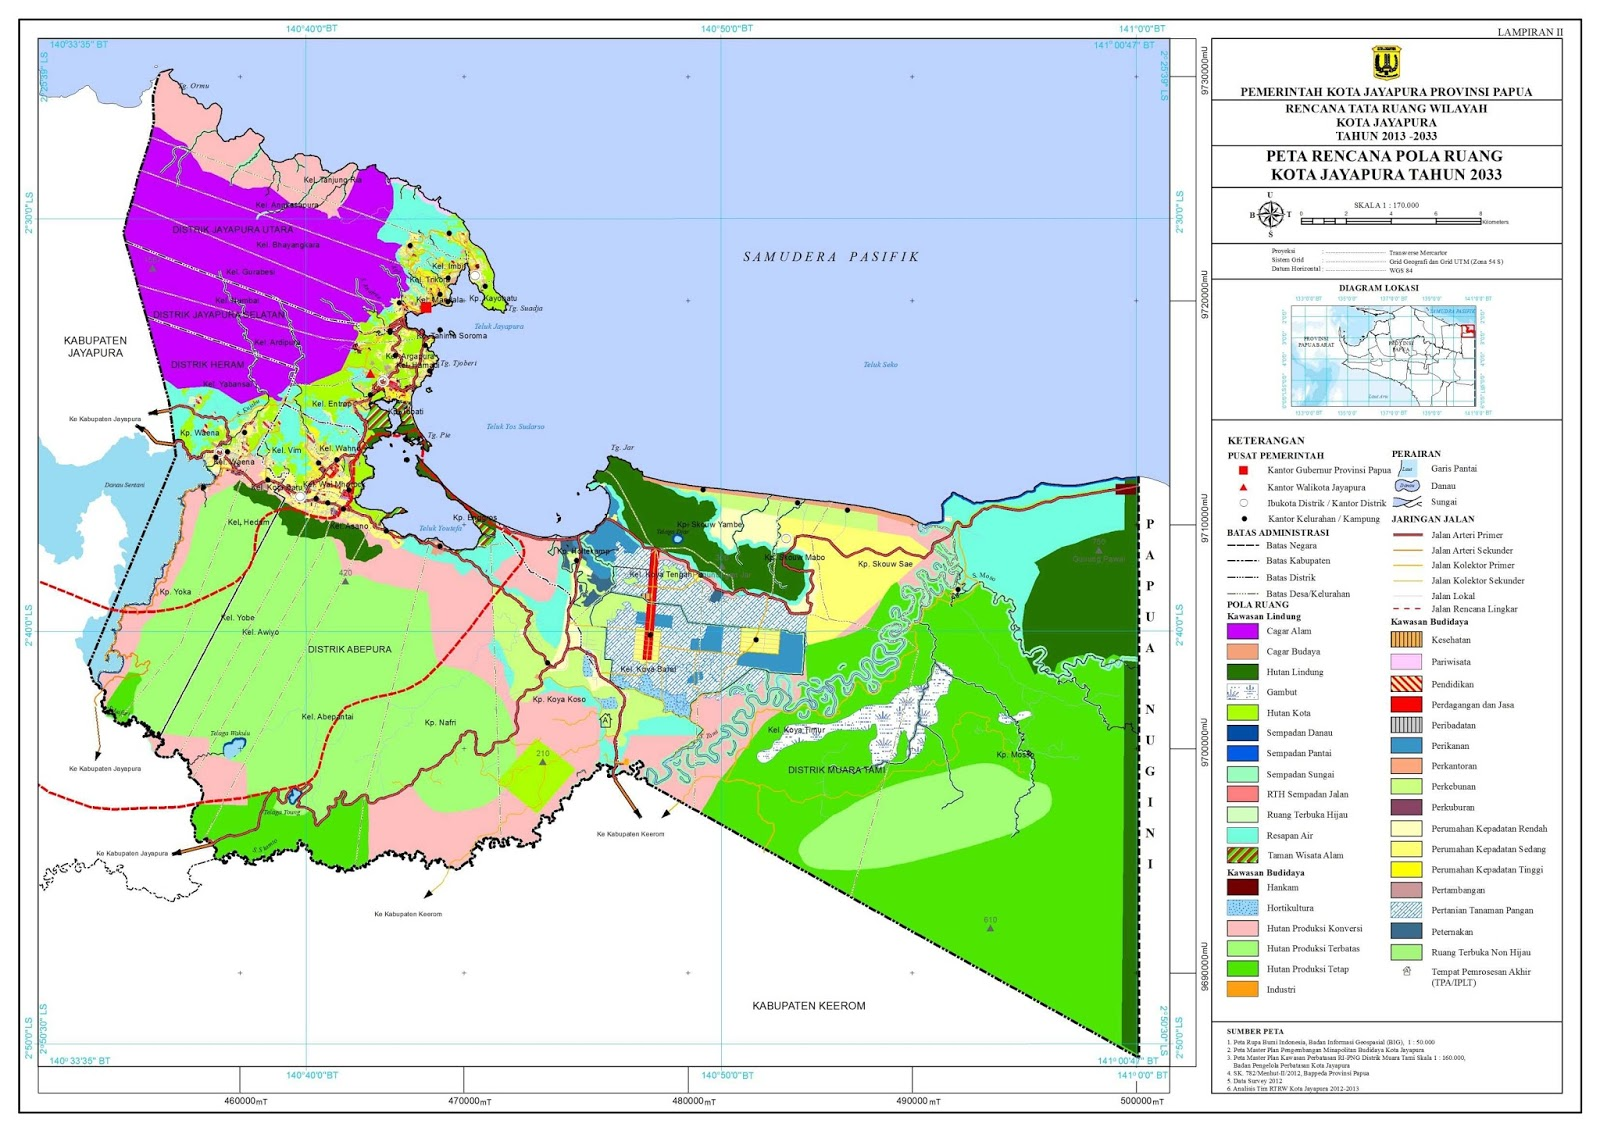 Gambaran Konstelasi Wilayah Sumber Rtrw Kota Jayapura 2013 2033 Teluk